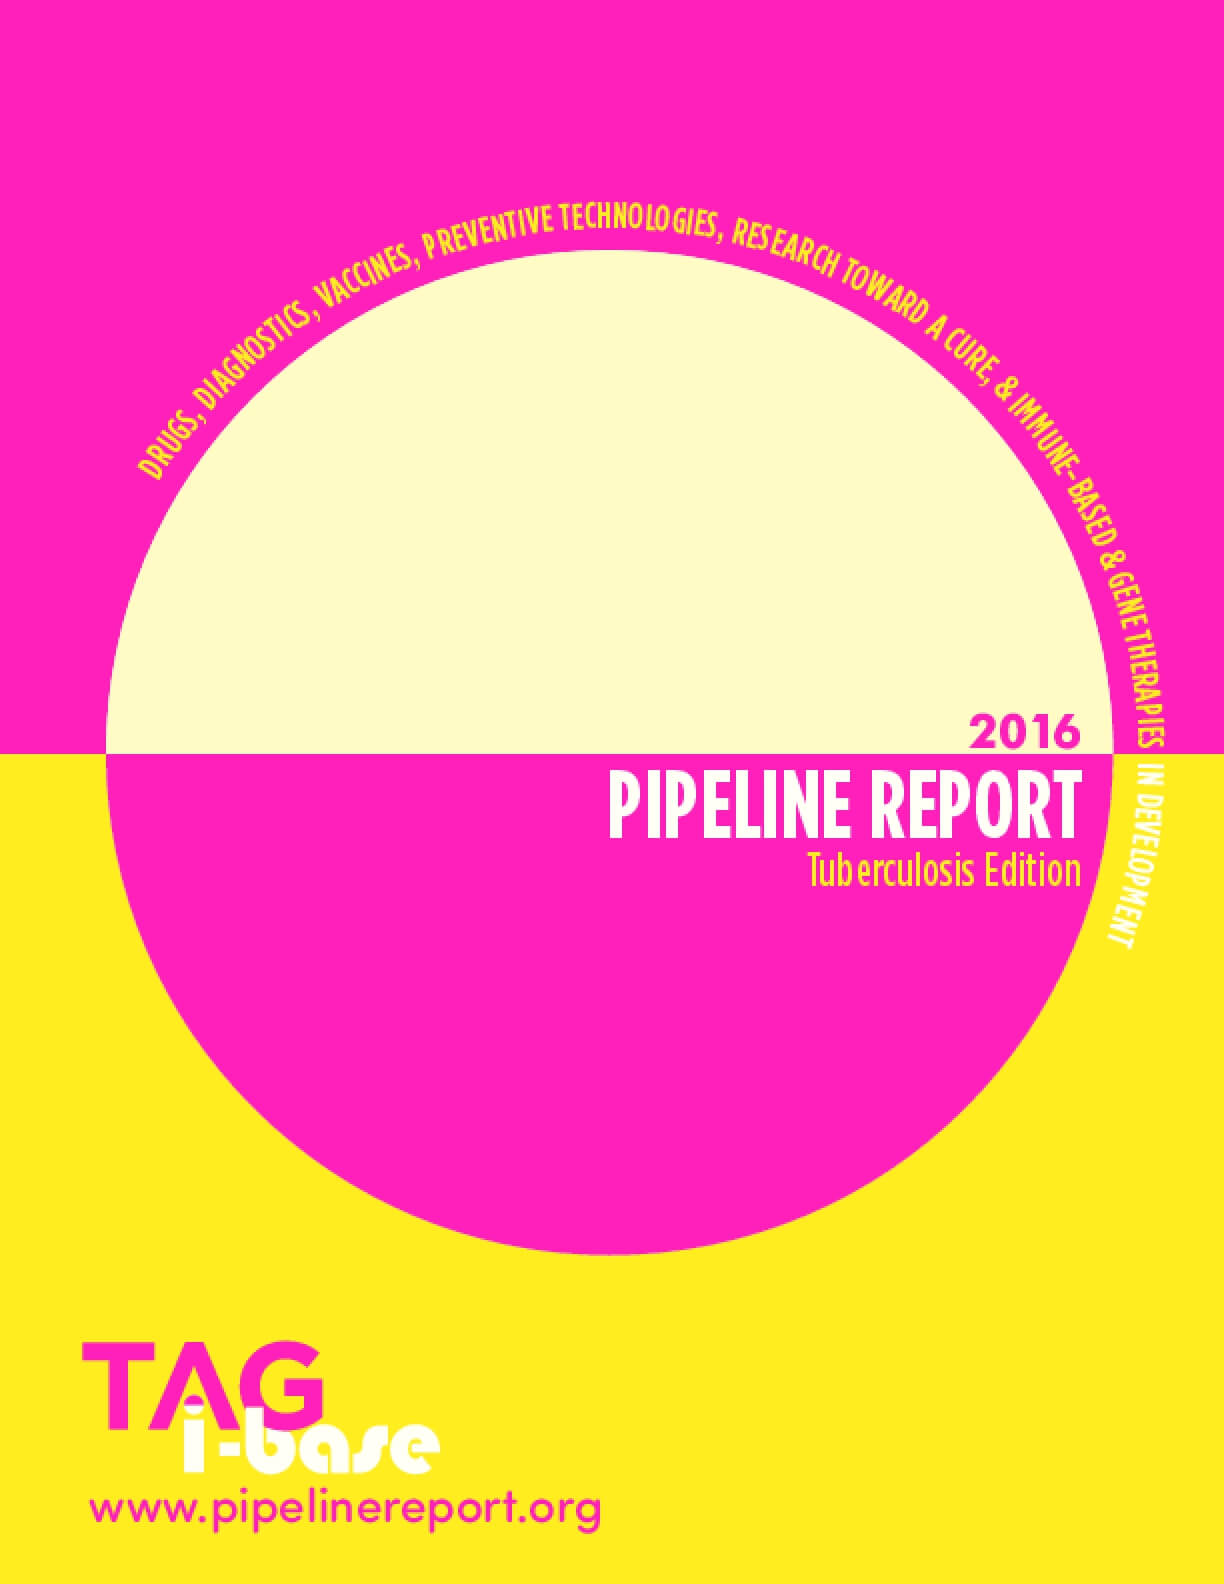 2016 Pipeline Report Tuberculosis Edition